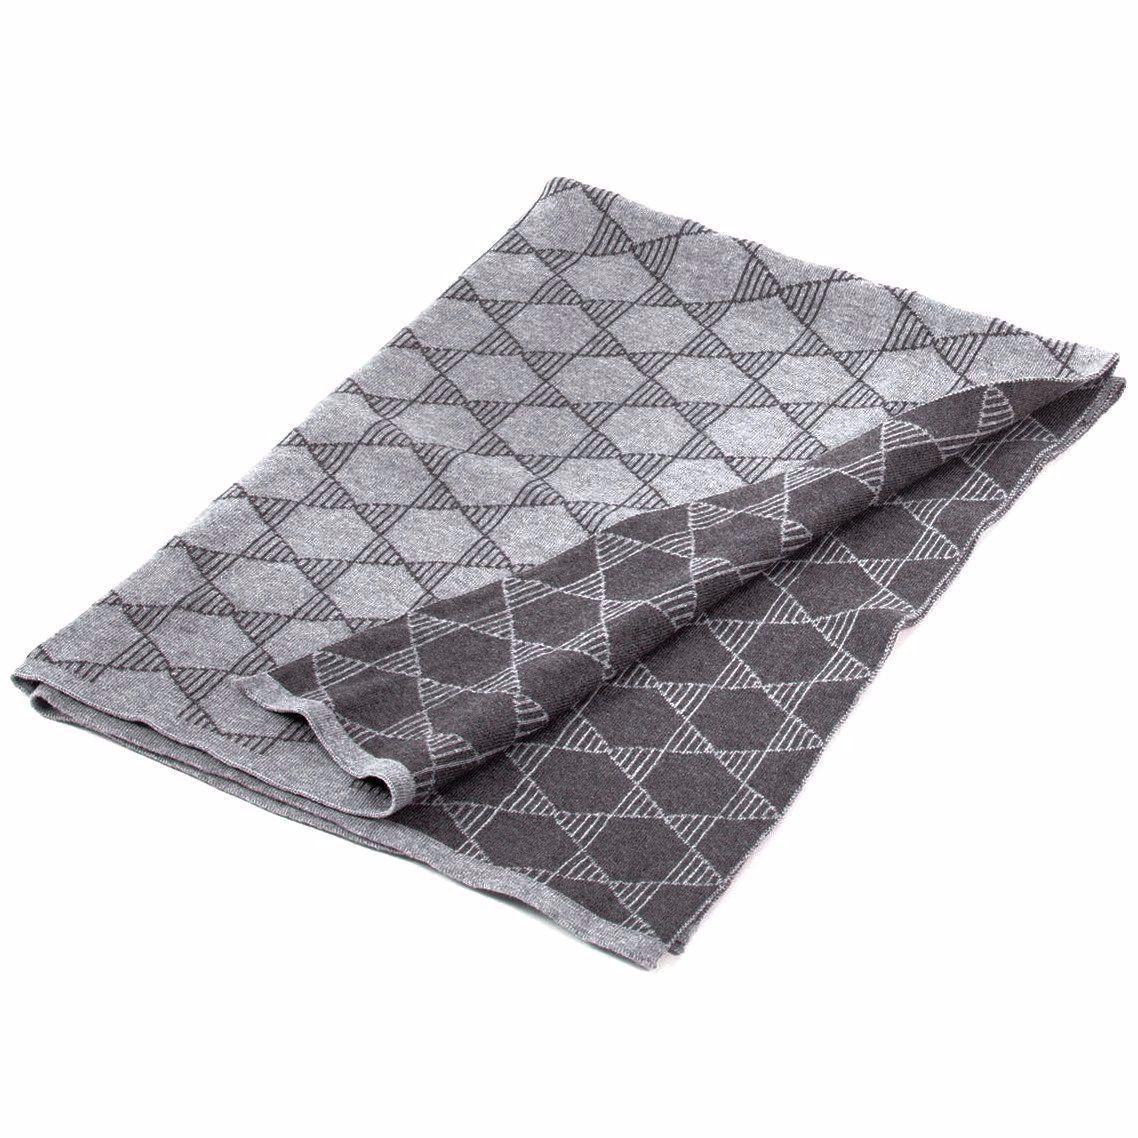 Geometric Knit Baby Blanket